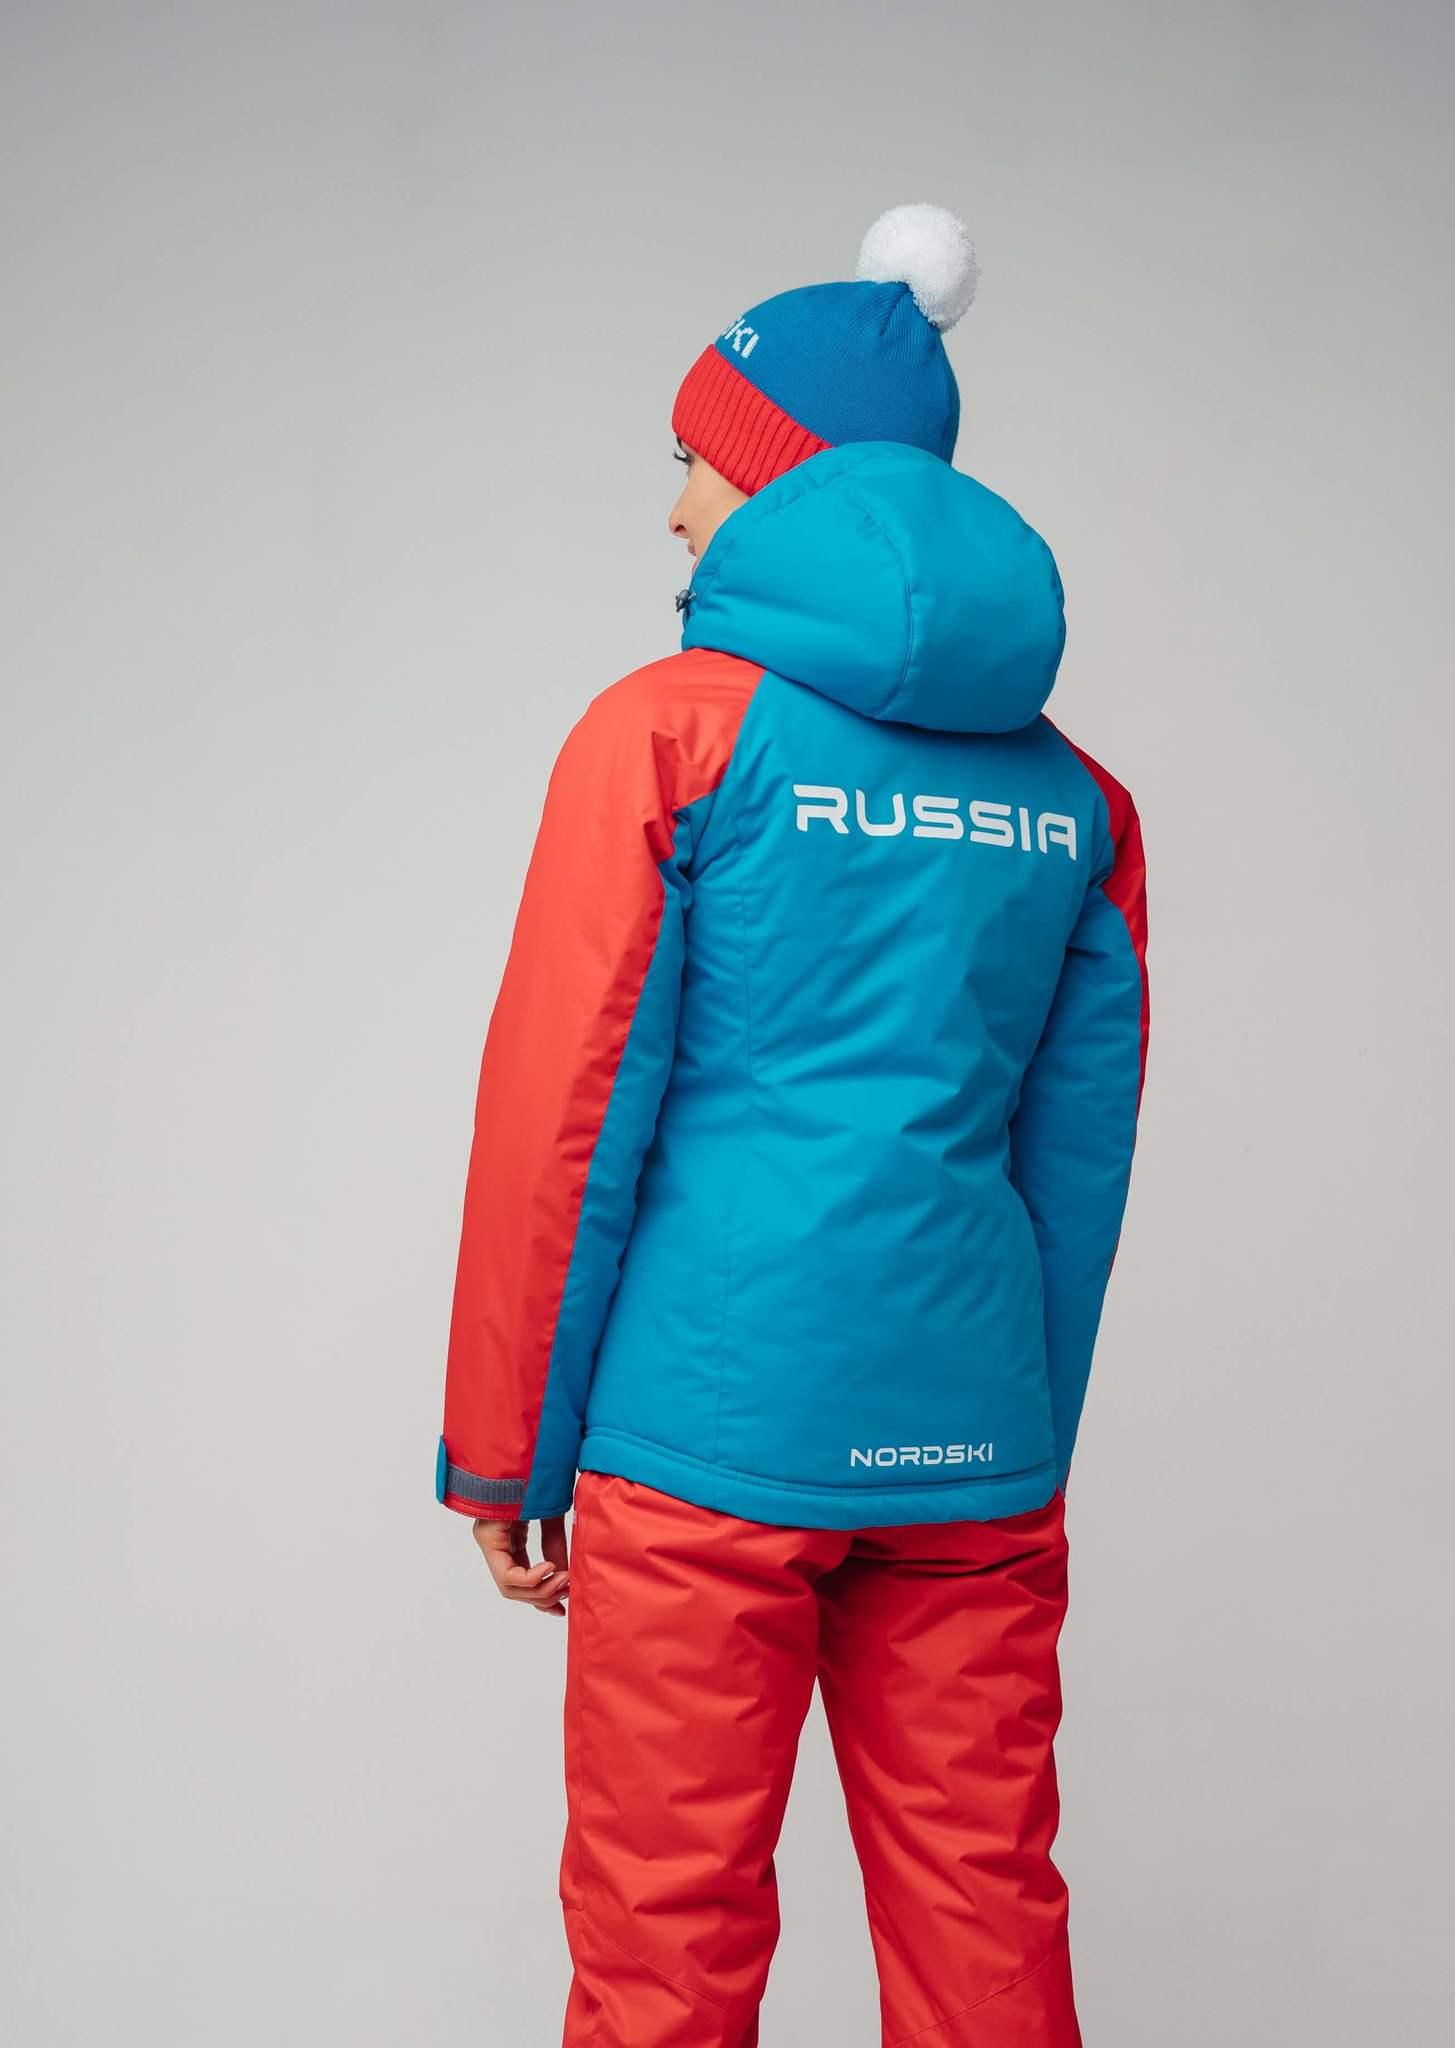 Nordski National 2.0 женская утепленная лыжная куртка - 2